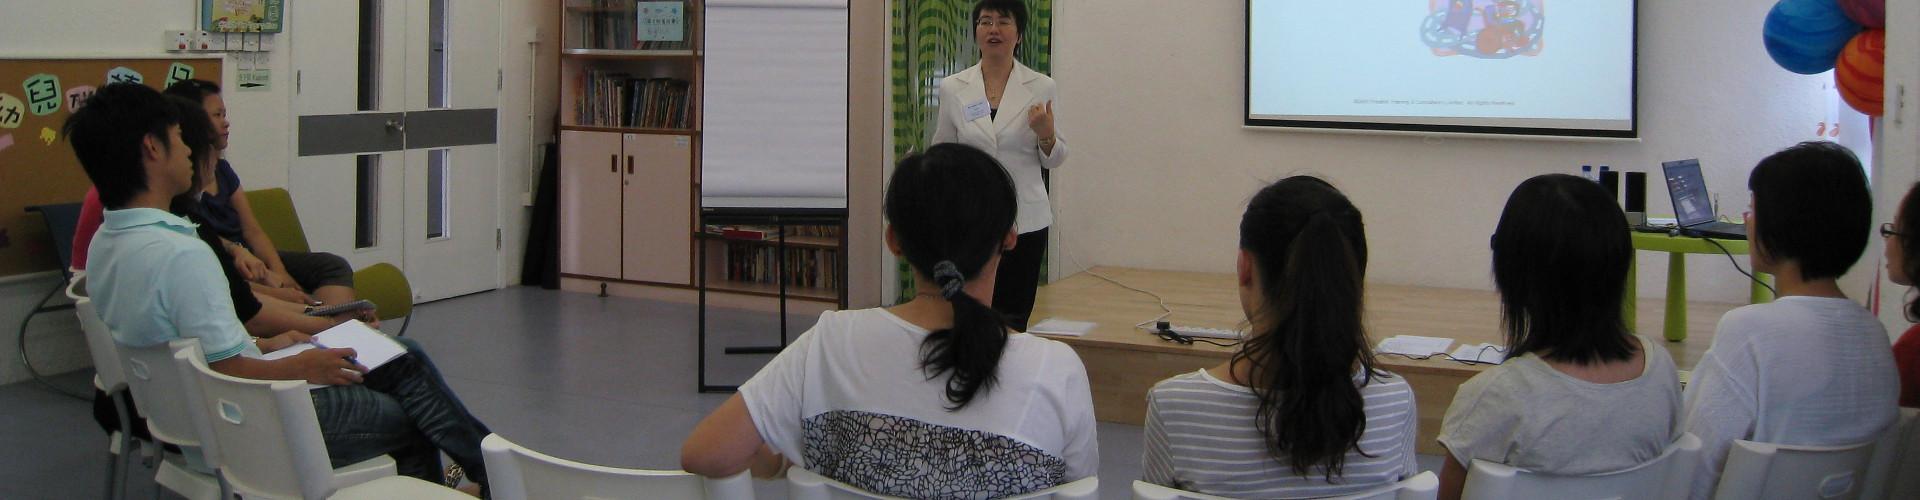 Classroom presentation / 課堂演示 / 课堂演示